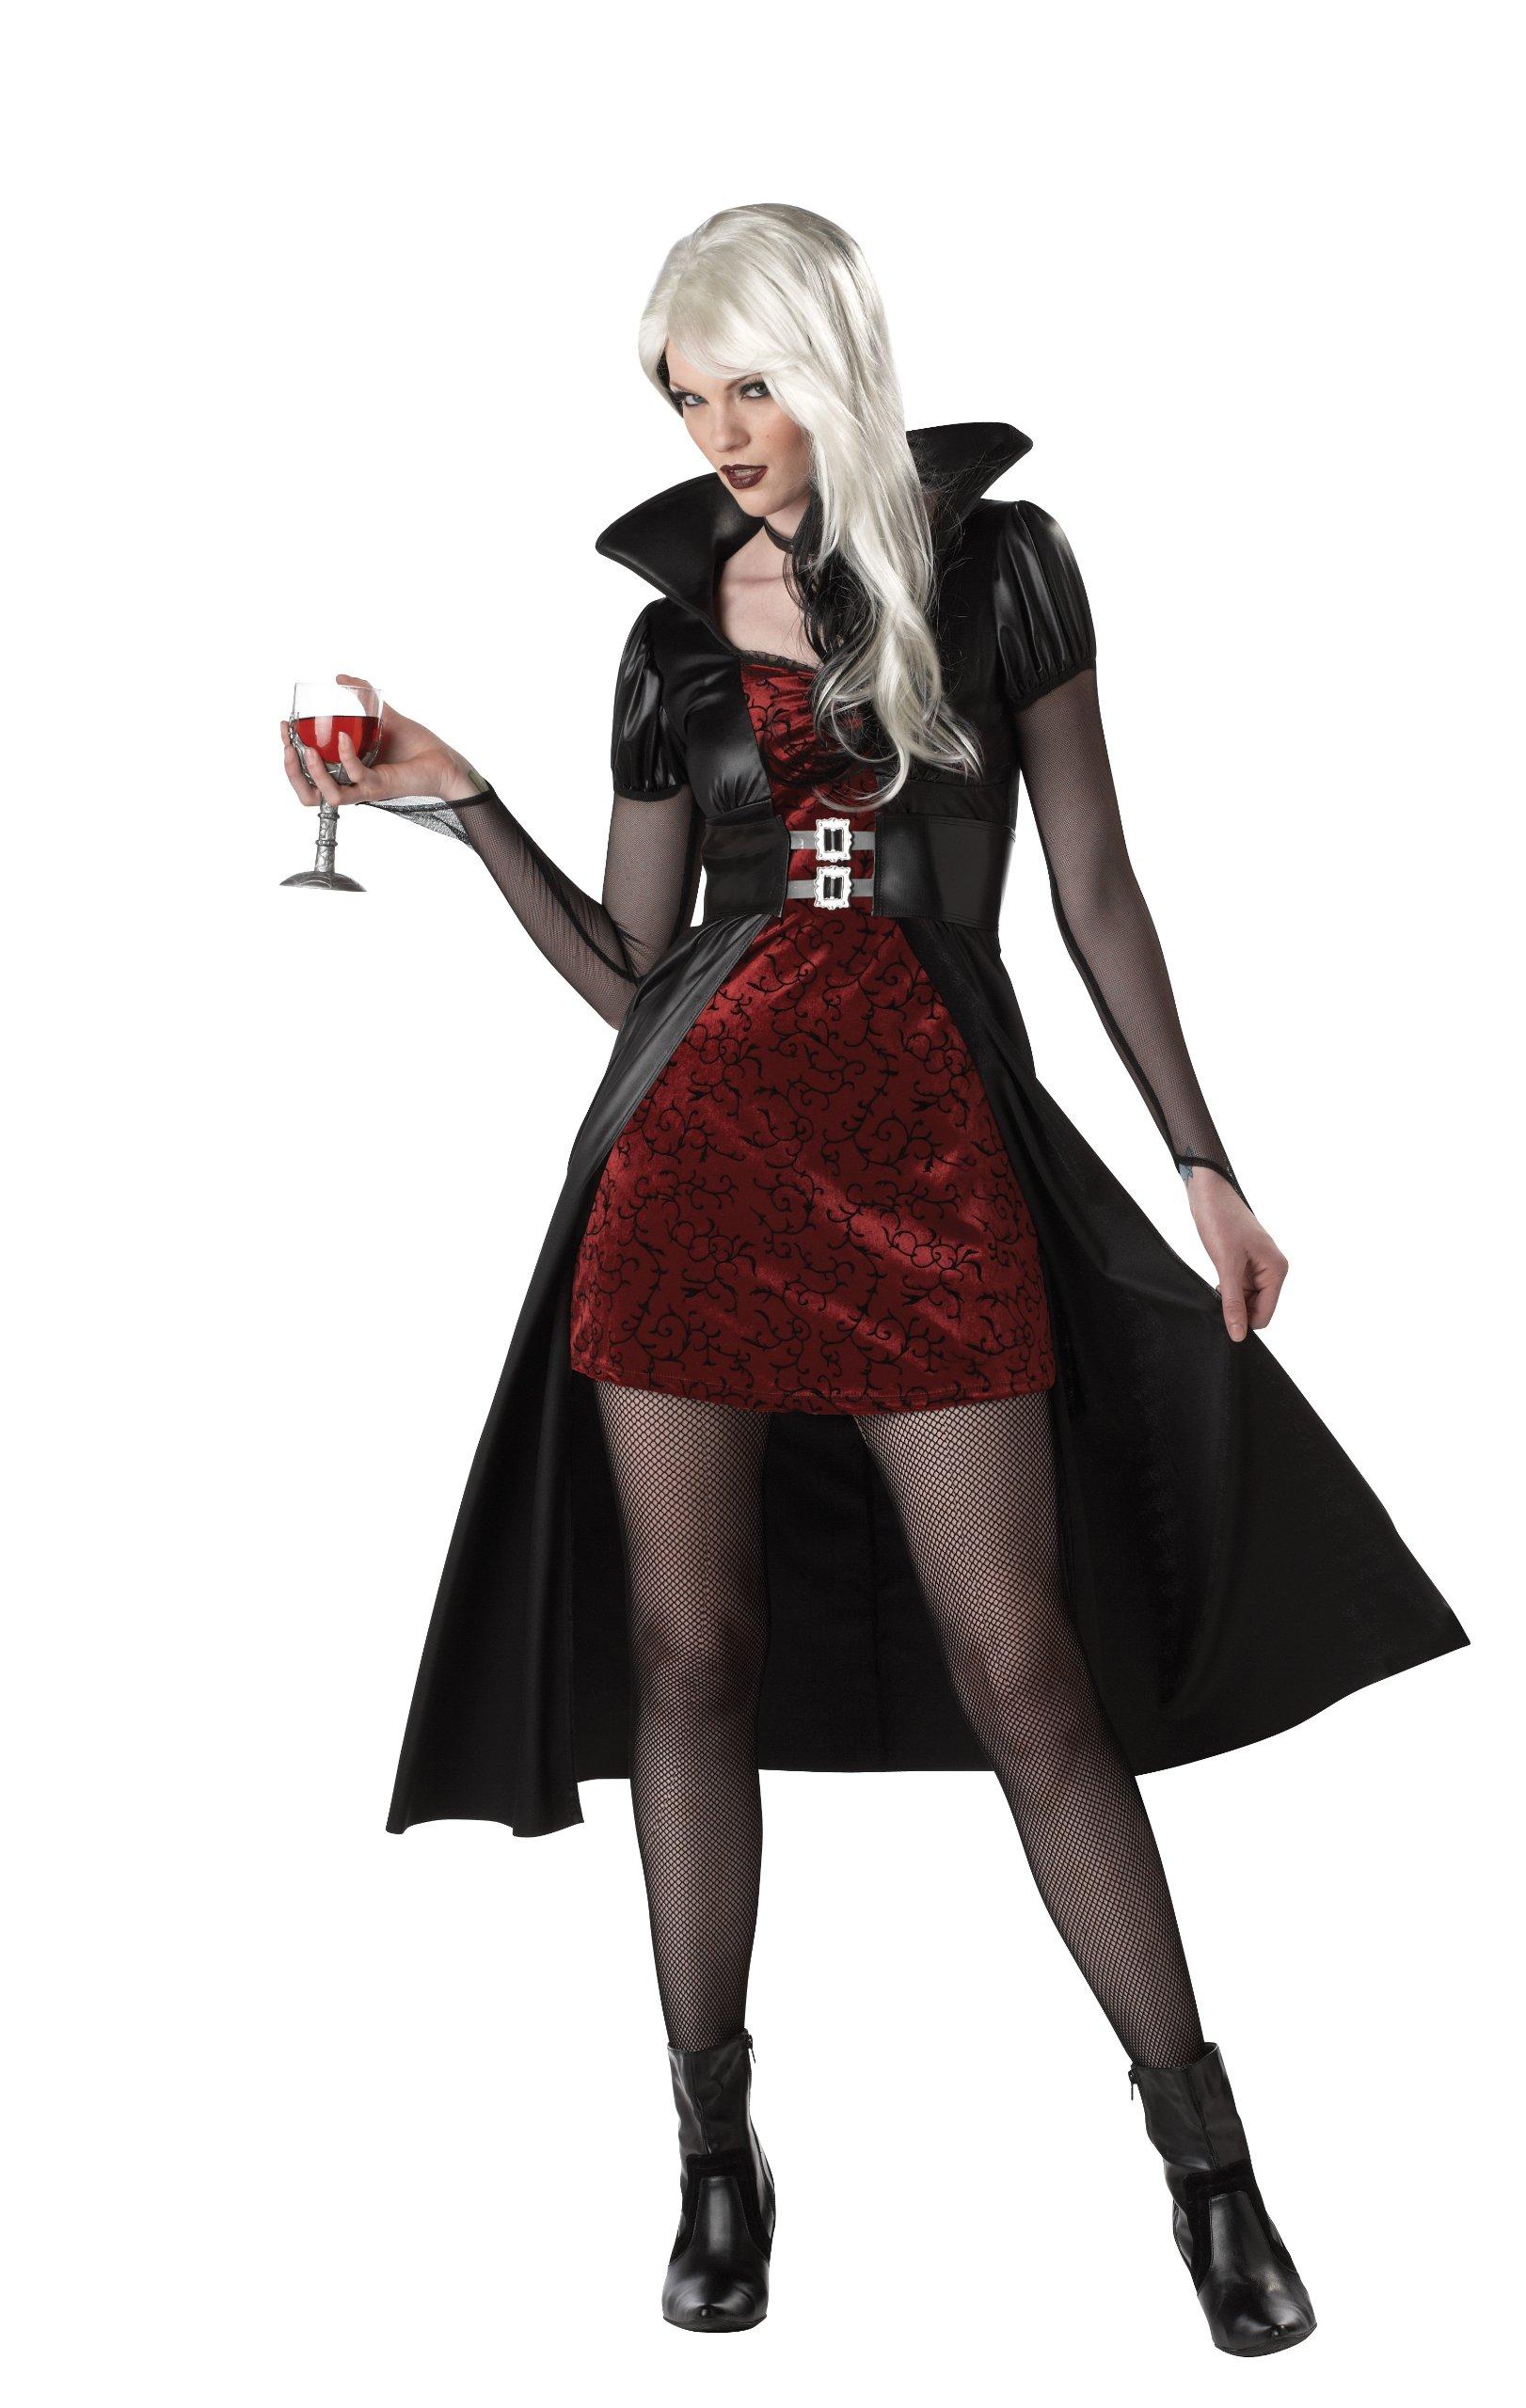 California Costumes Women's Blood Thirsty Beauty Costume, Black/Burgundy, Medium